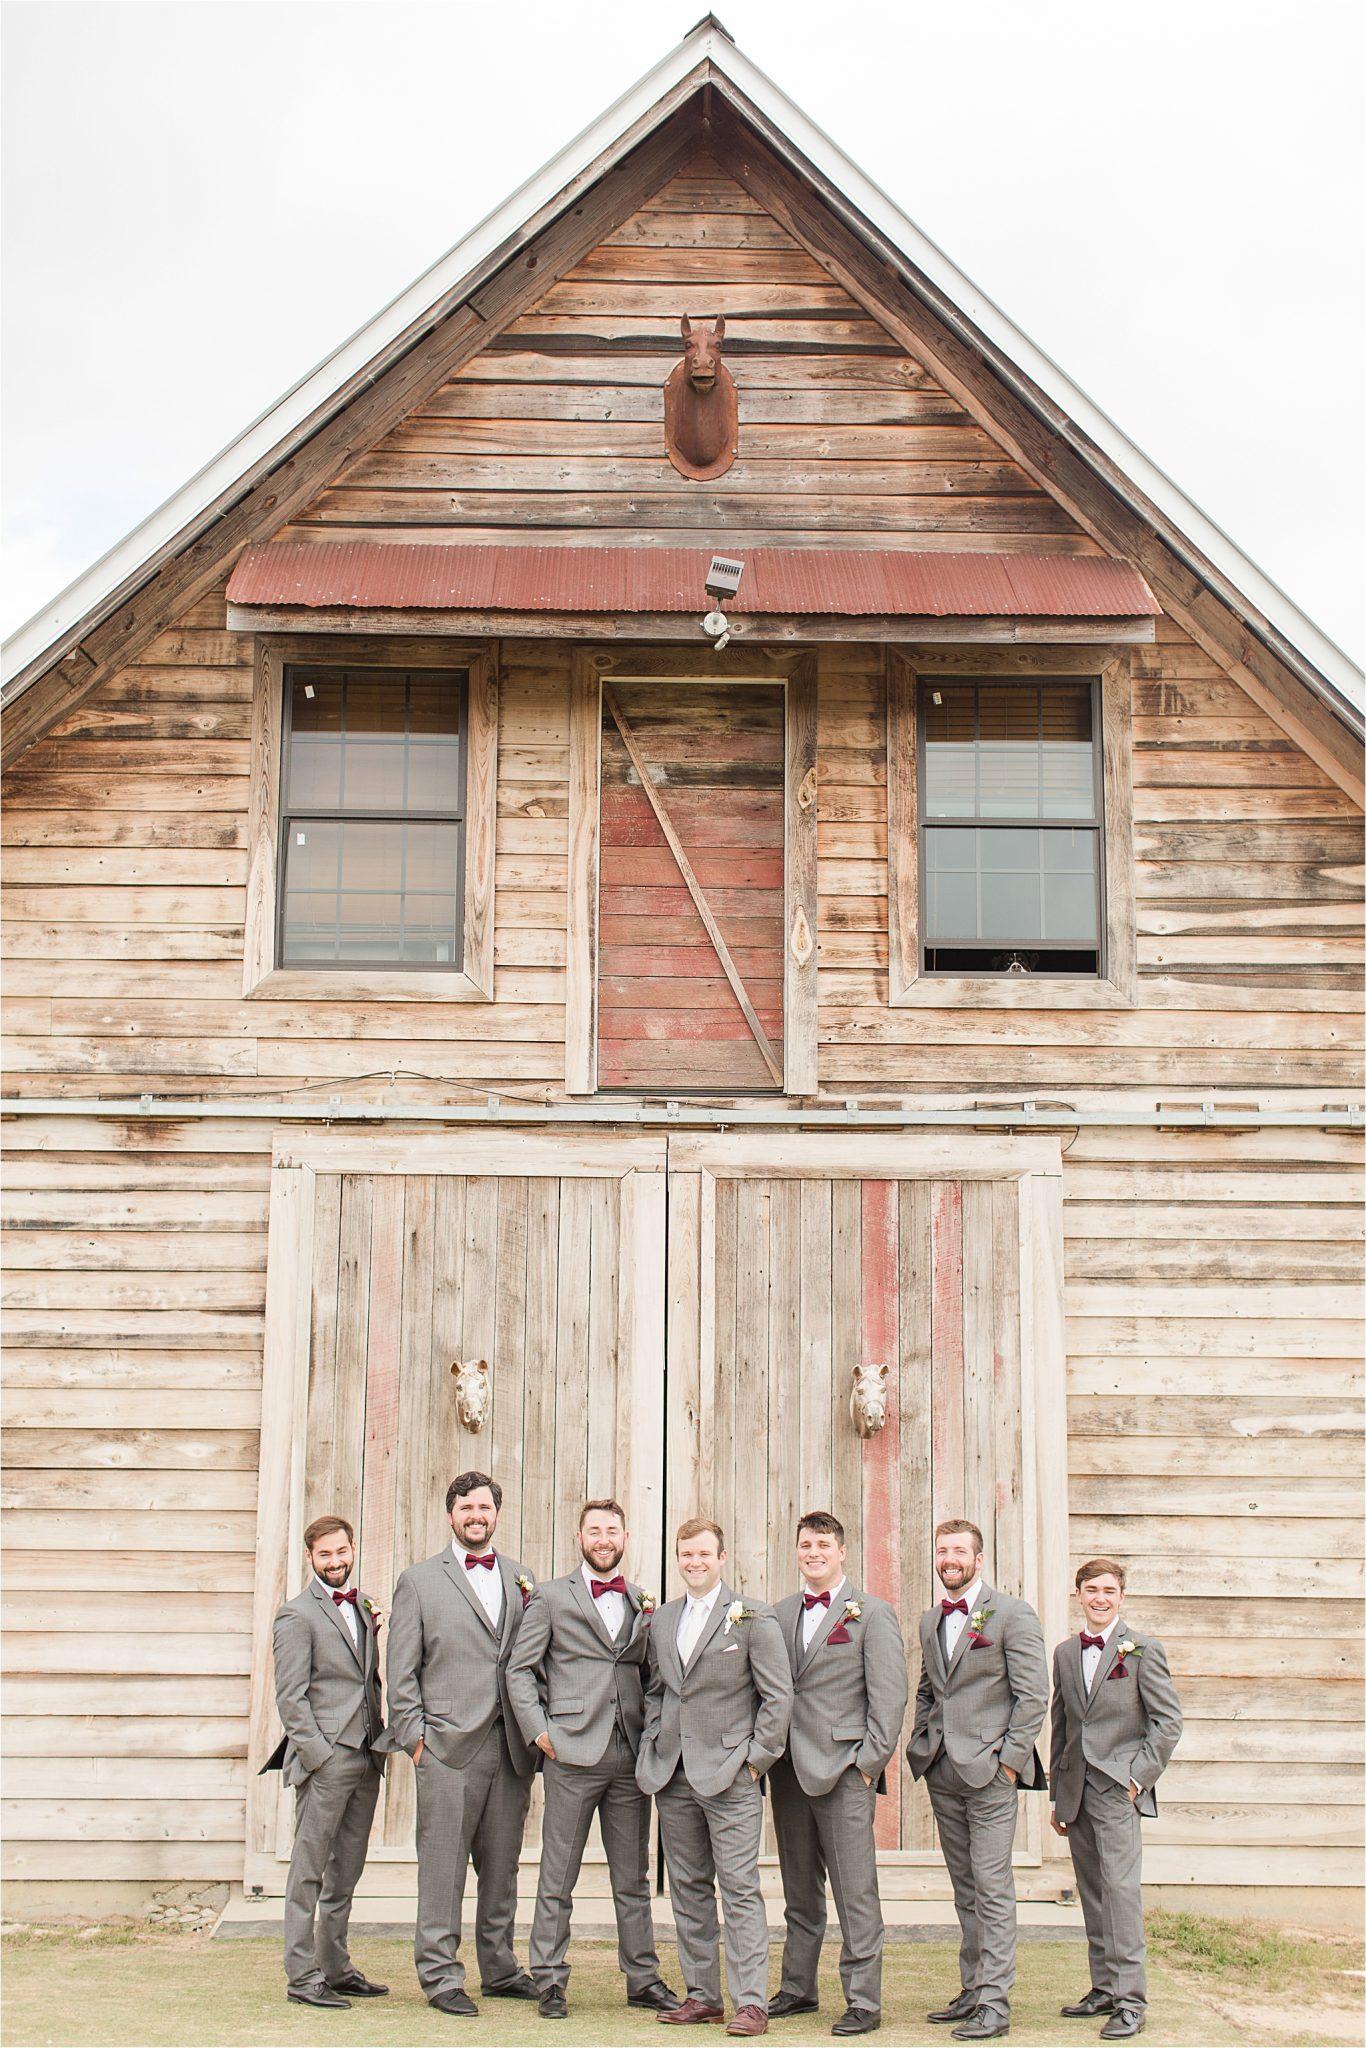 The Barn at Bridlewood Wedding-Hattiesburg, Mississippi-Kelsey + Blaker-Wedding details-Groom-Groomsmen-Grey tuxedo-Barn wedding-Grey themed wedding